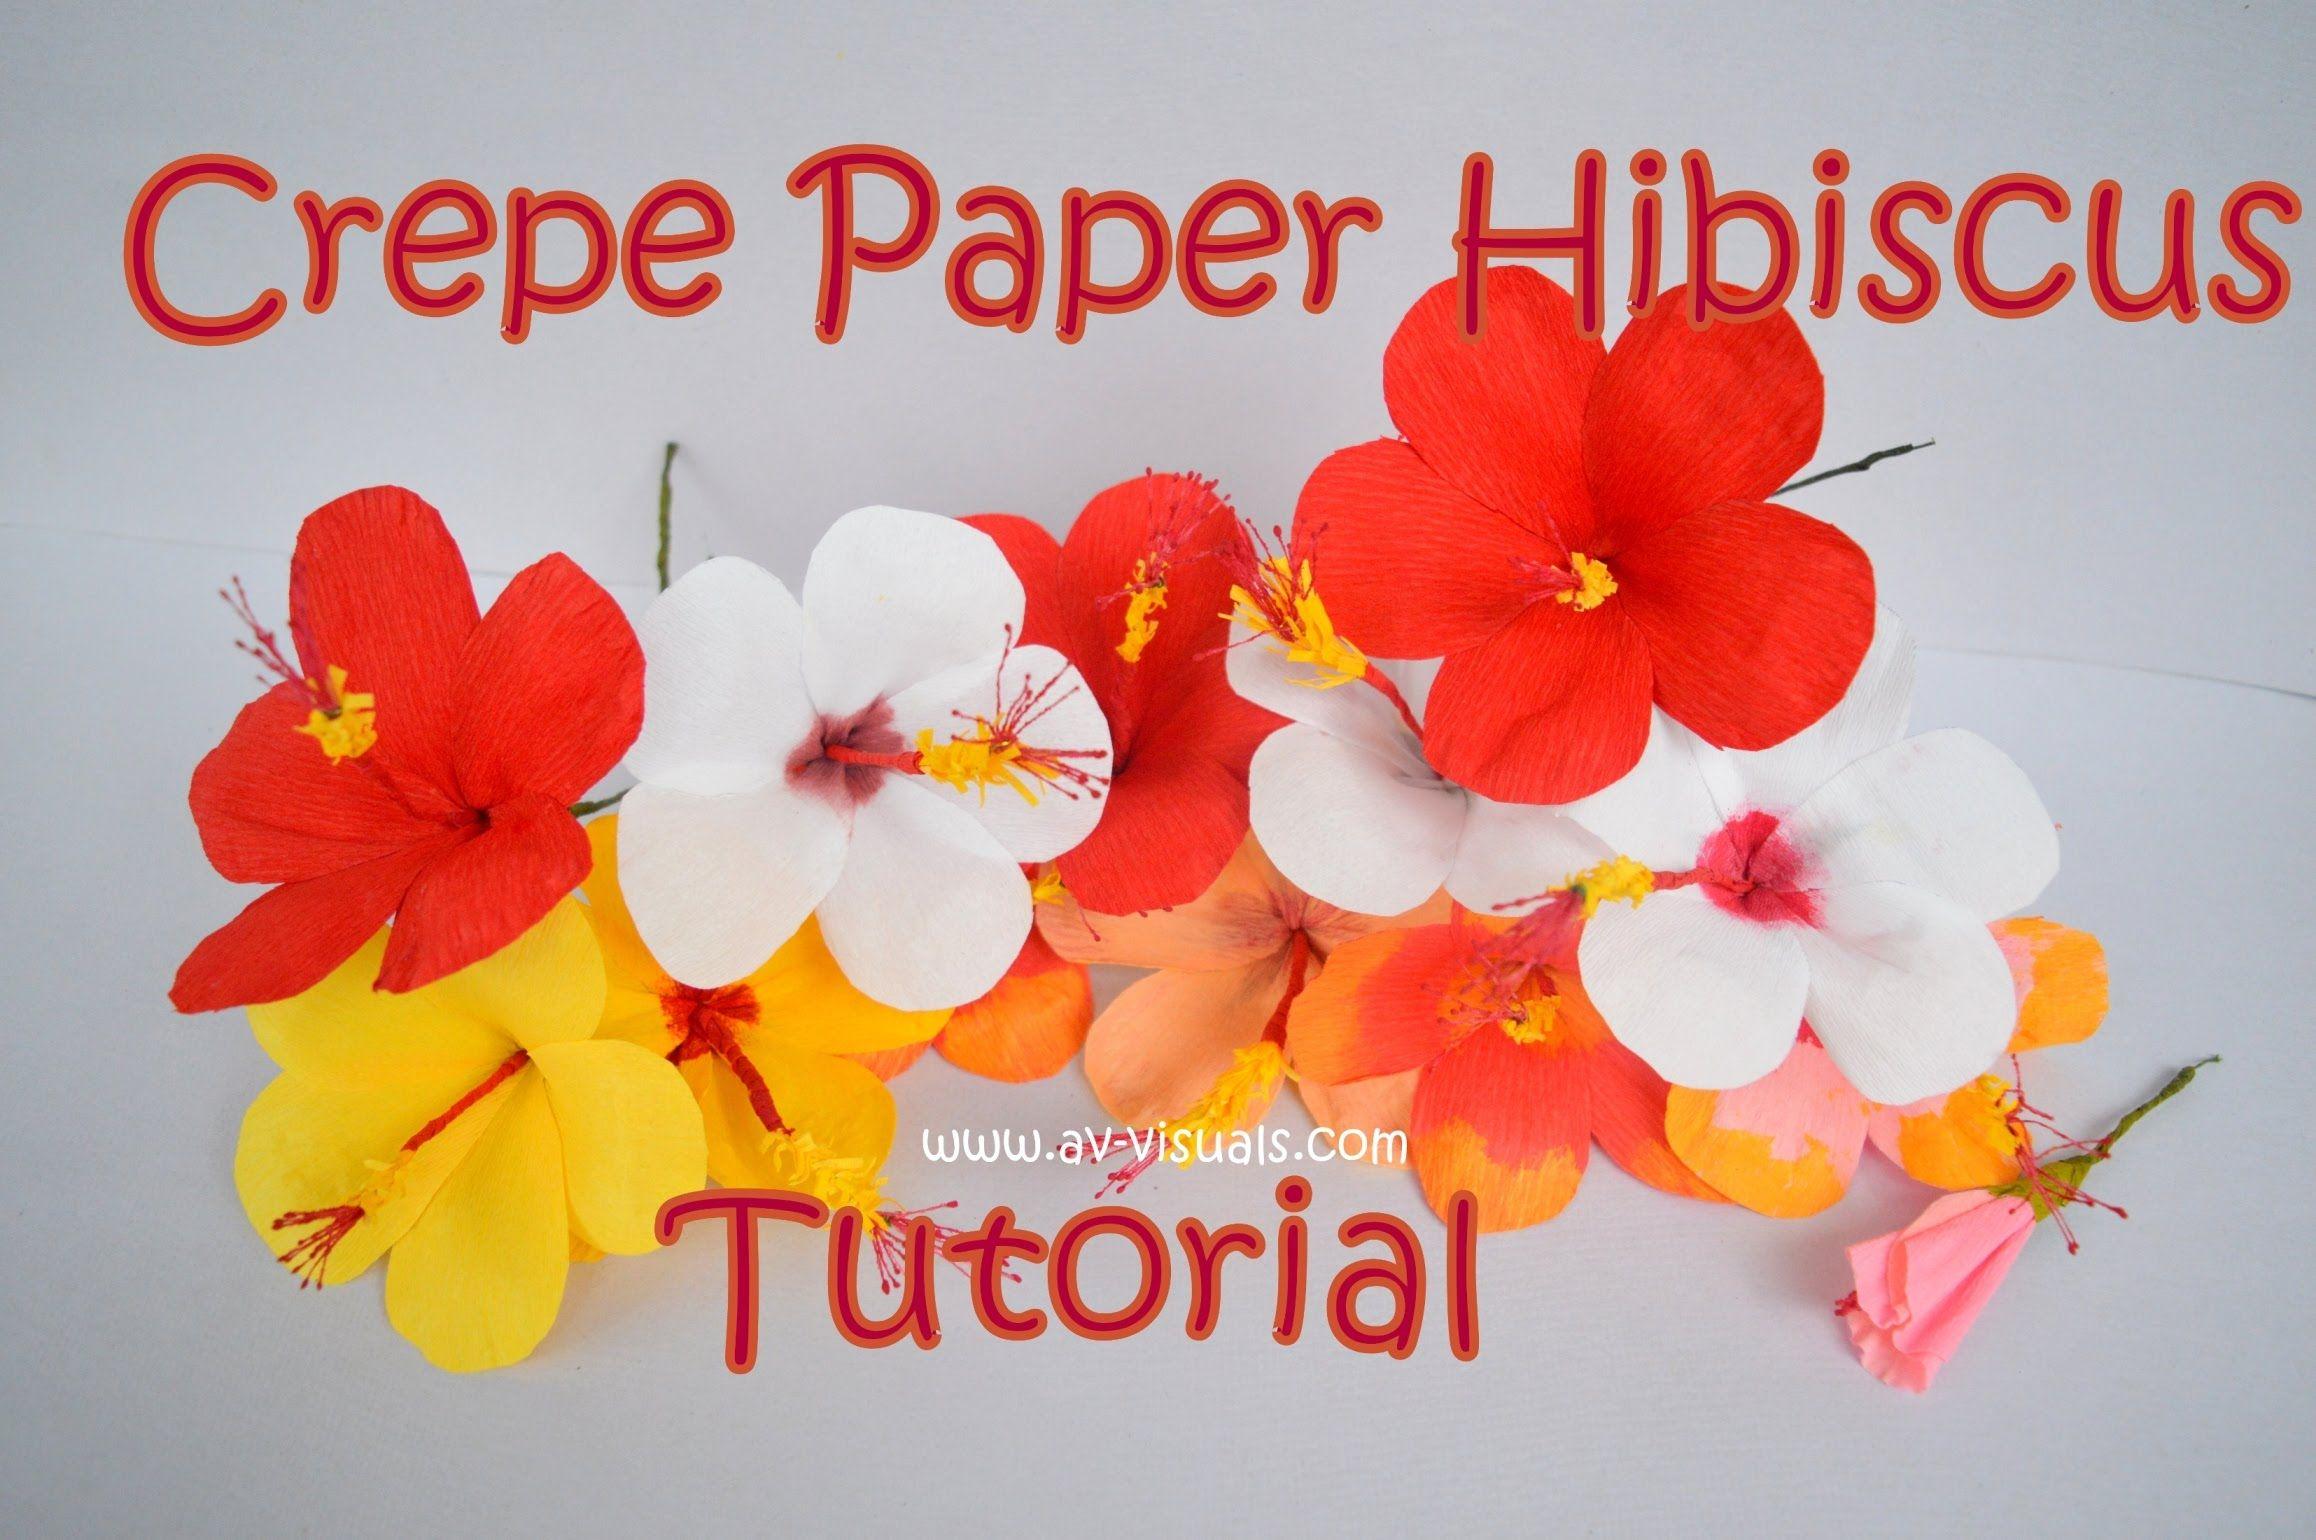 How To Make Hibiscus Flower From Crepe Paper Tutorial Av Visuals